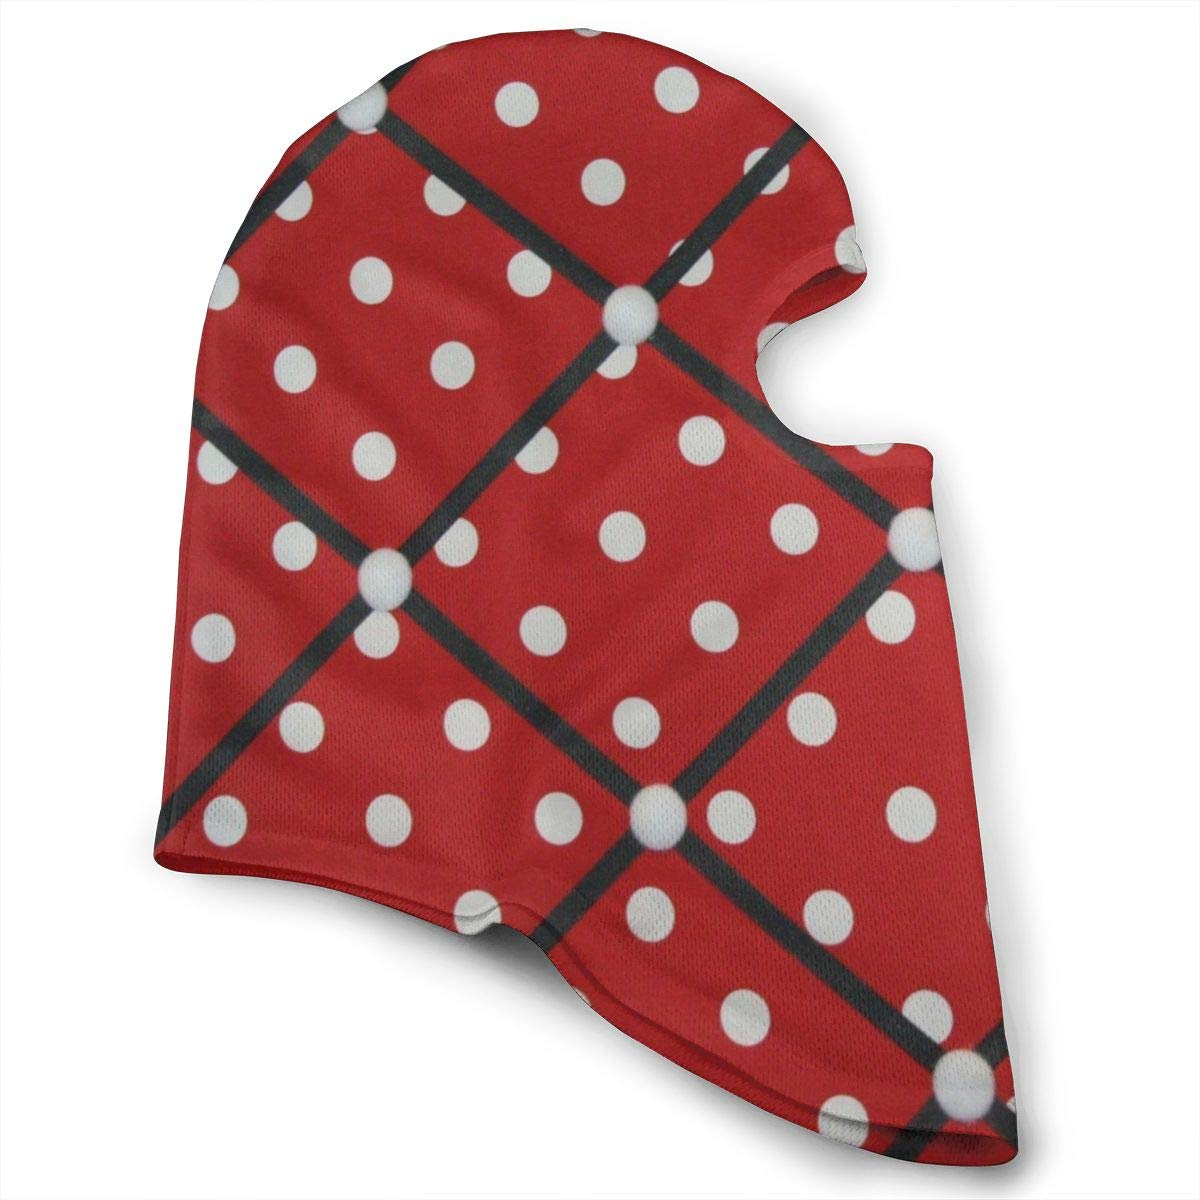 LoveBea Balaclava Red White Polka Dot Full Face Masks Ski Headcover Motorcycle Hood Cycling Sports Mountaineering